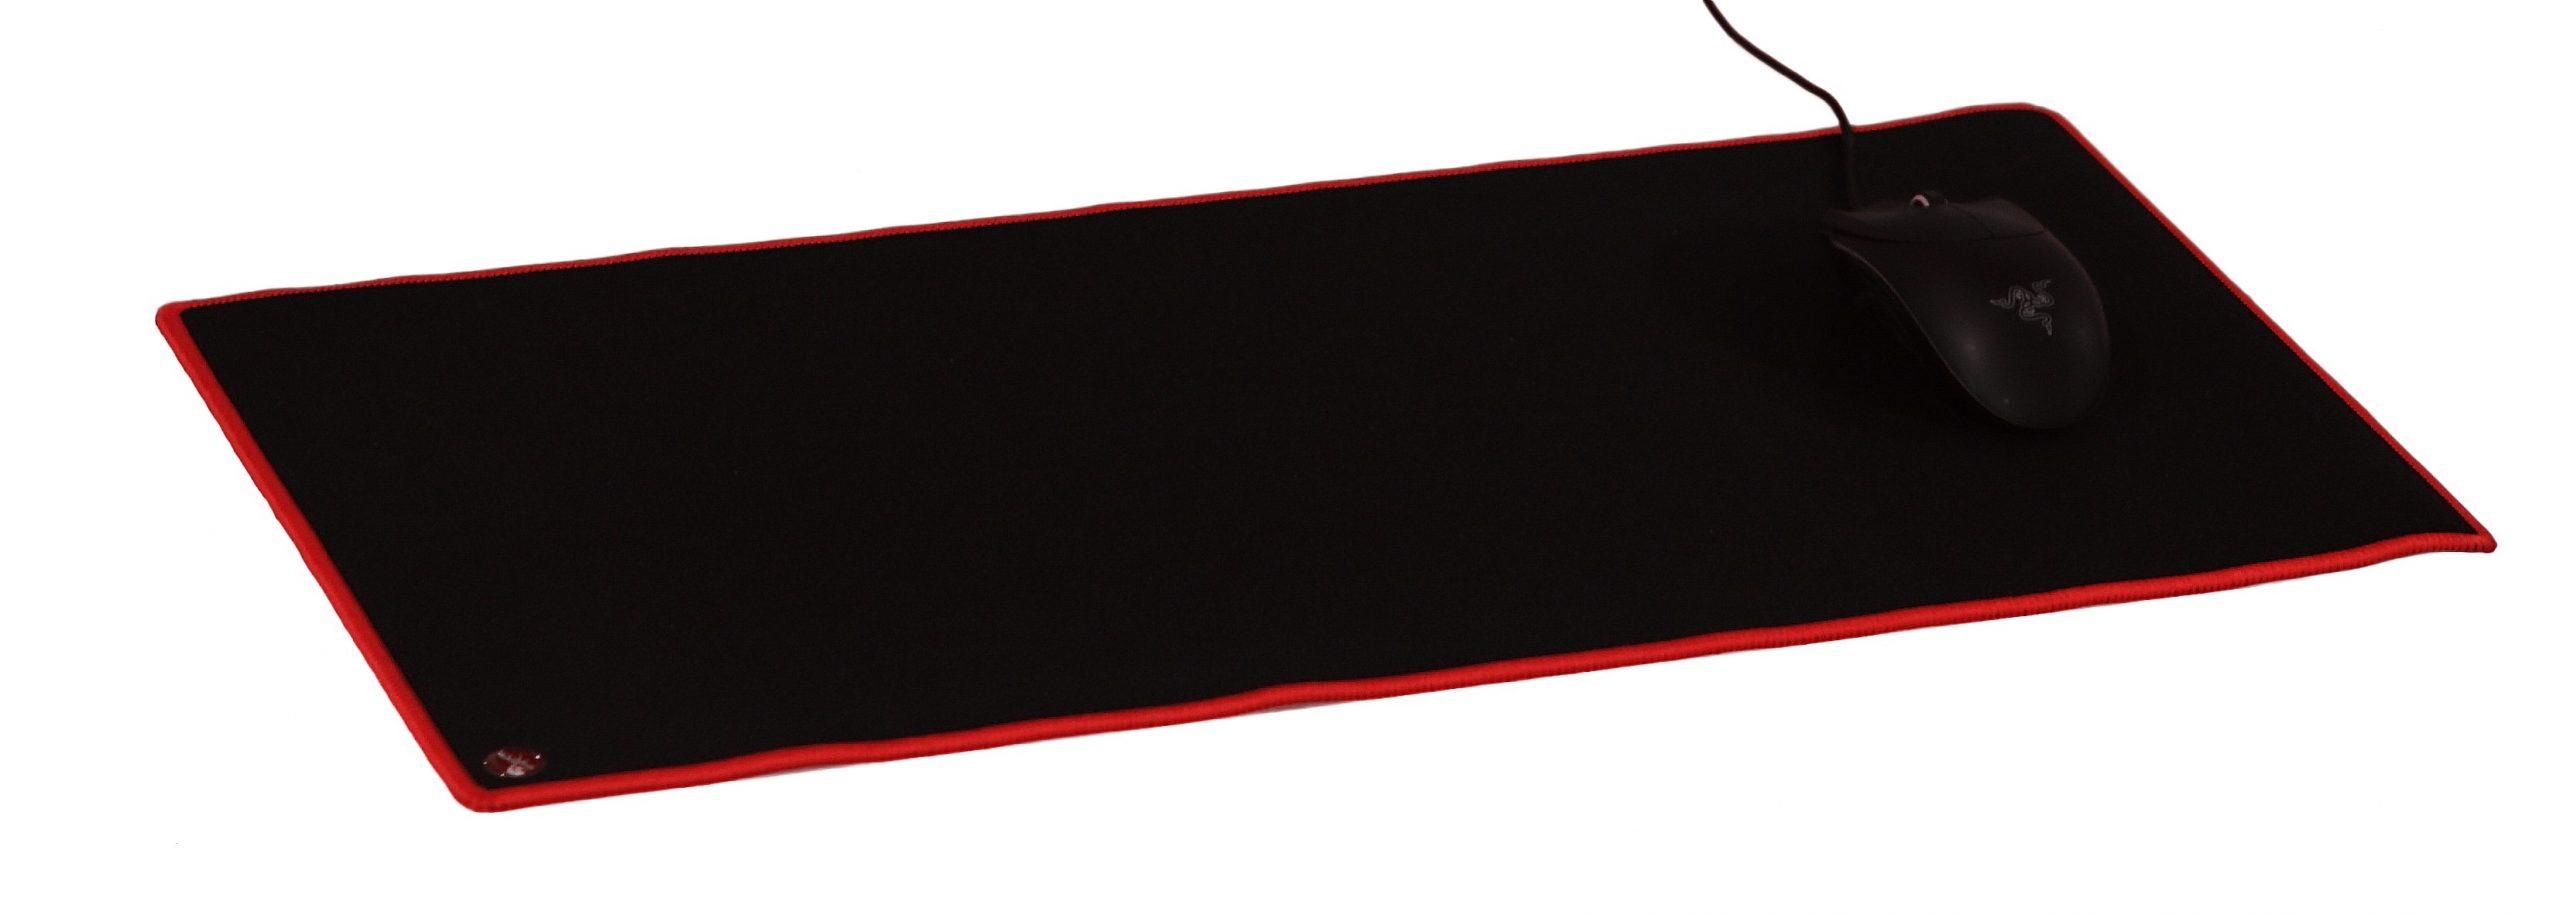 Stor Premium Gamingmusmatta 60x30cm - Svart